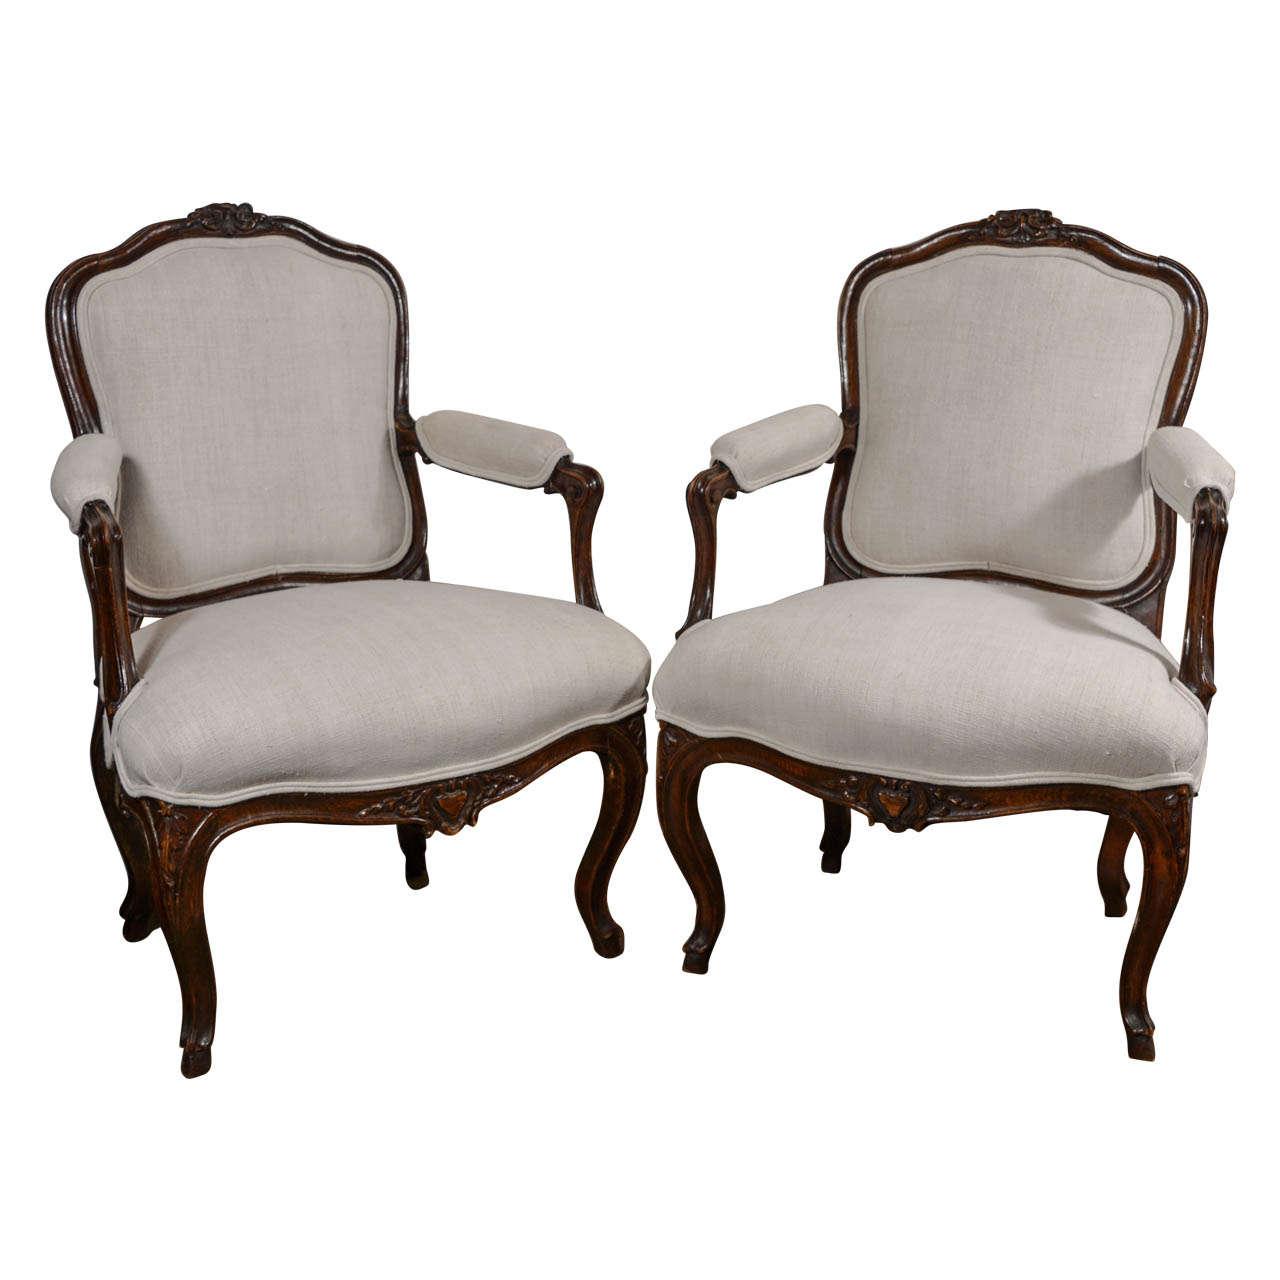 18th century louis xvi walnut chairs at 1stdibs - Louis th chairs ...